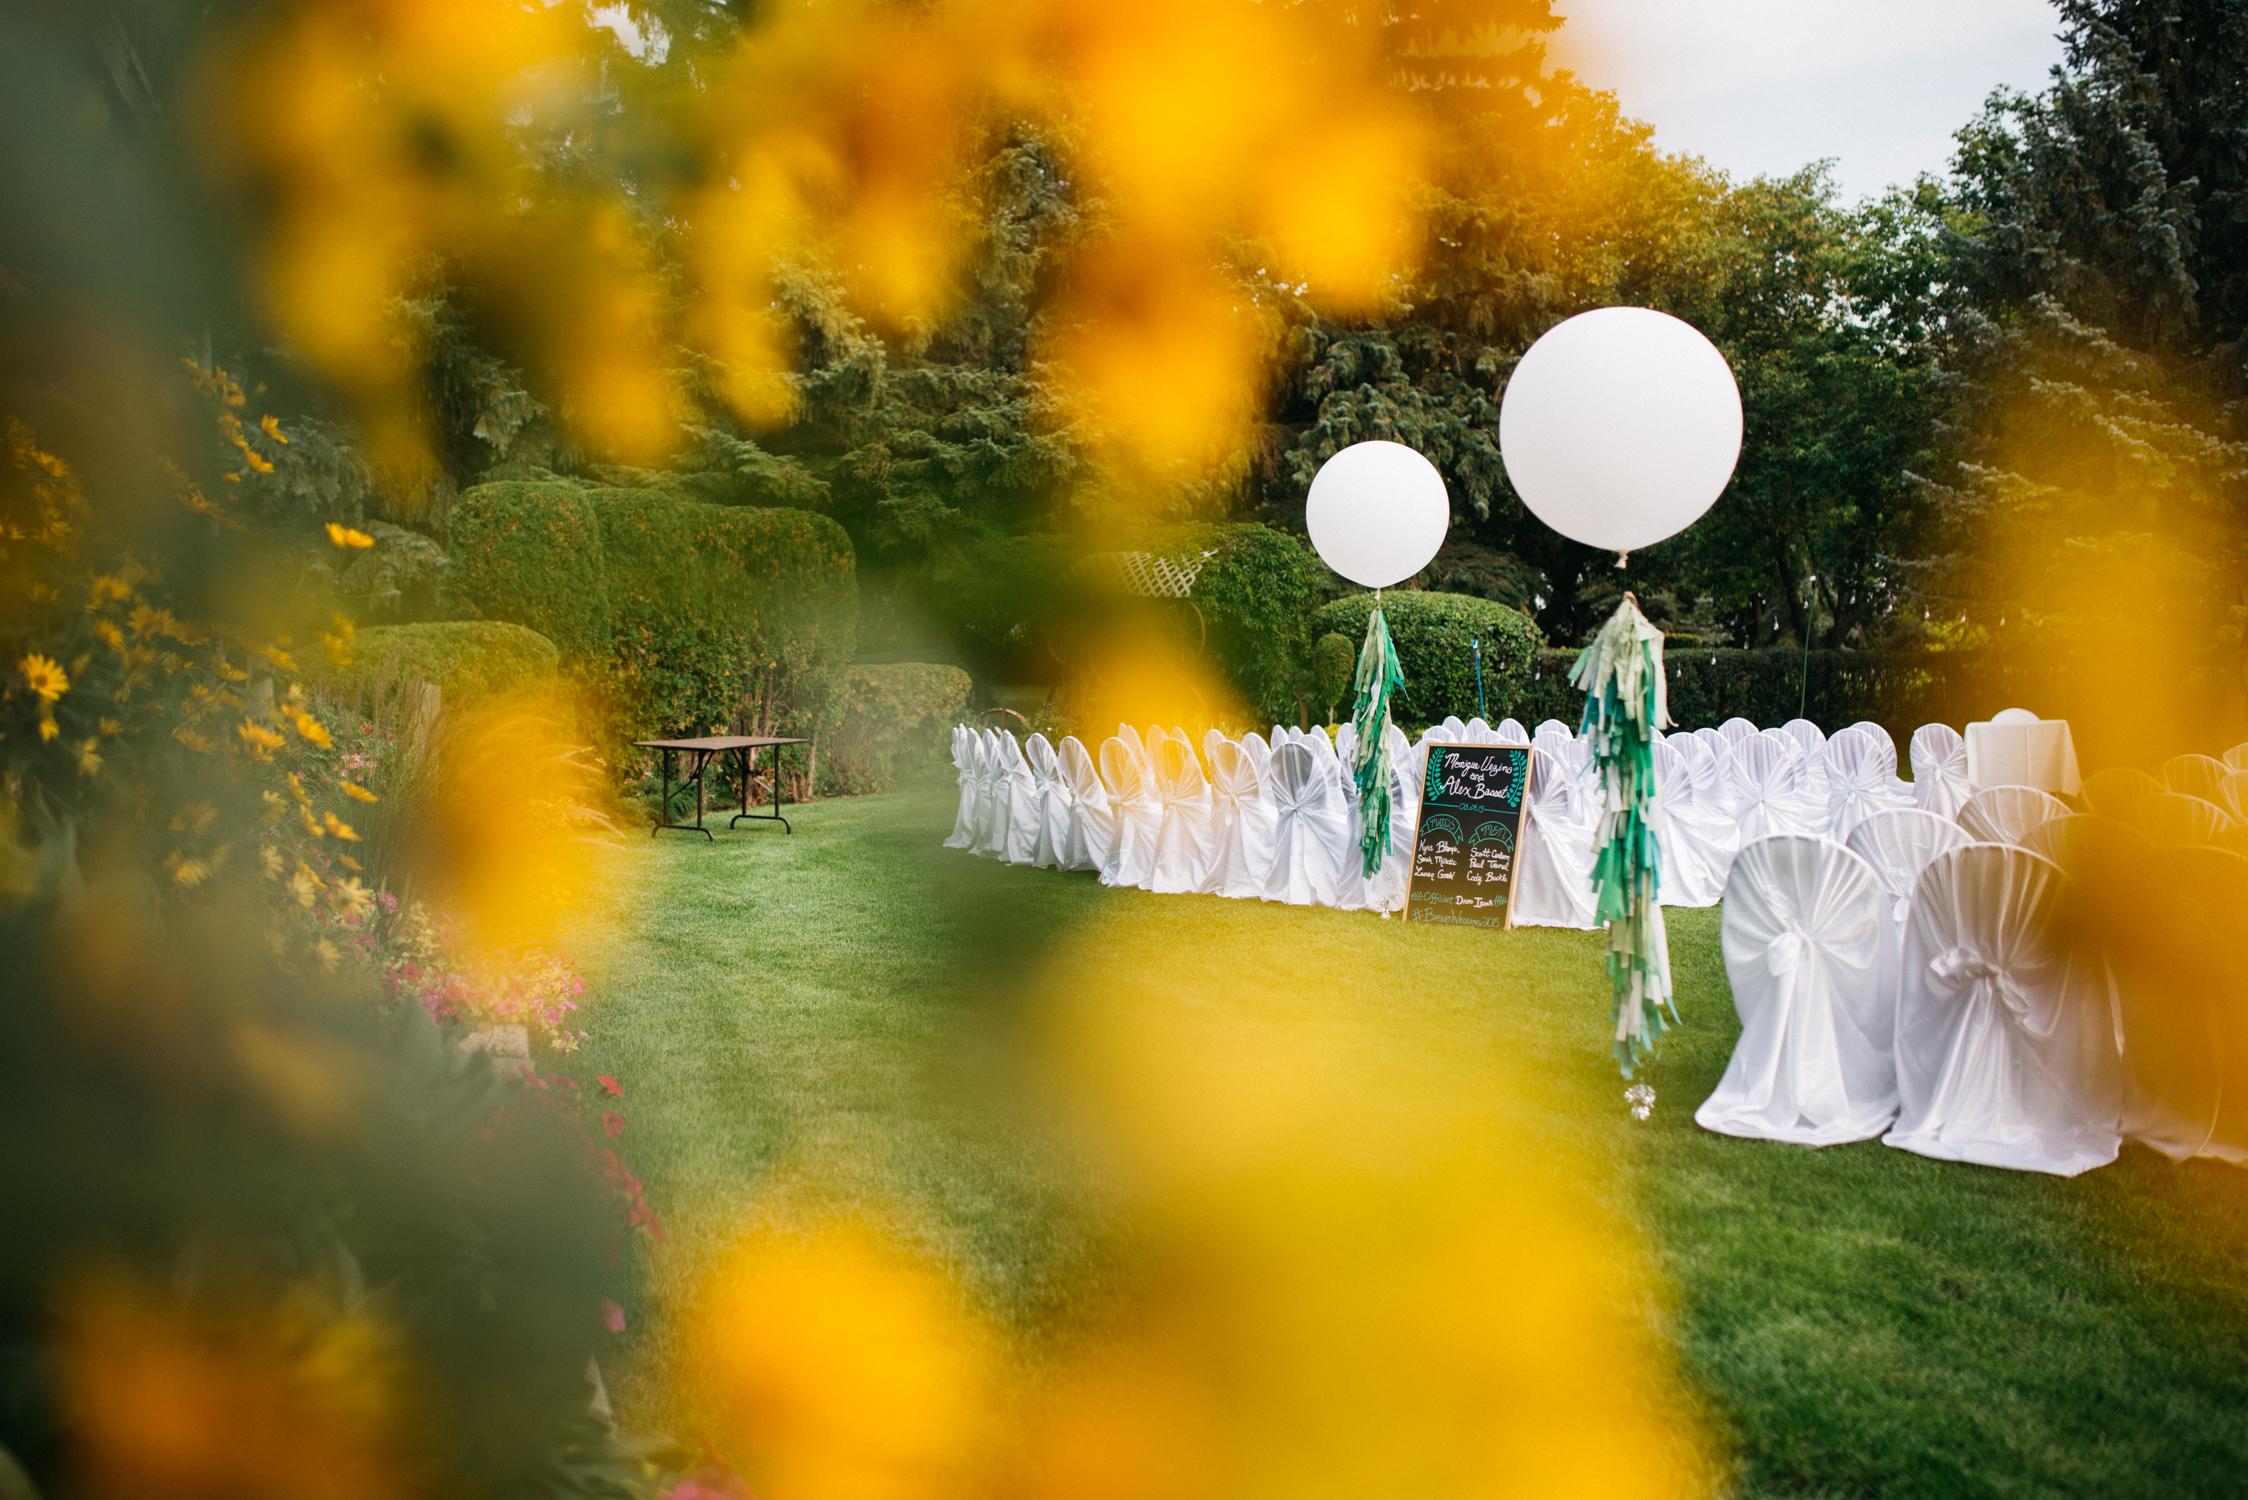 039_saskatoon_saskatchewan_small_town_wedding.jpg